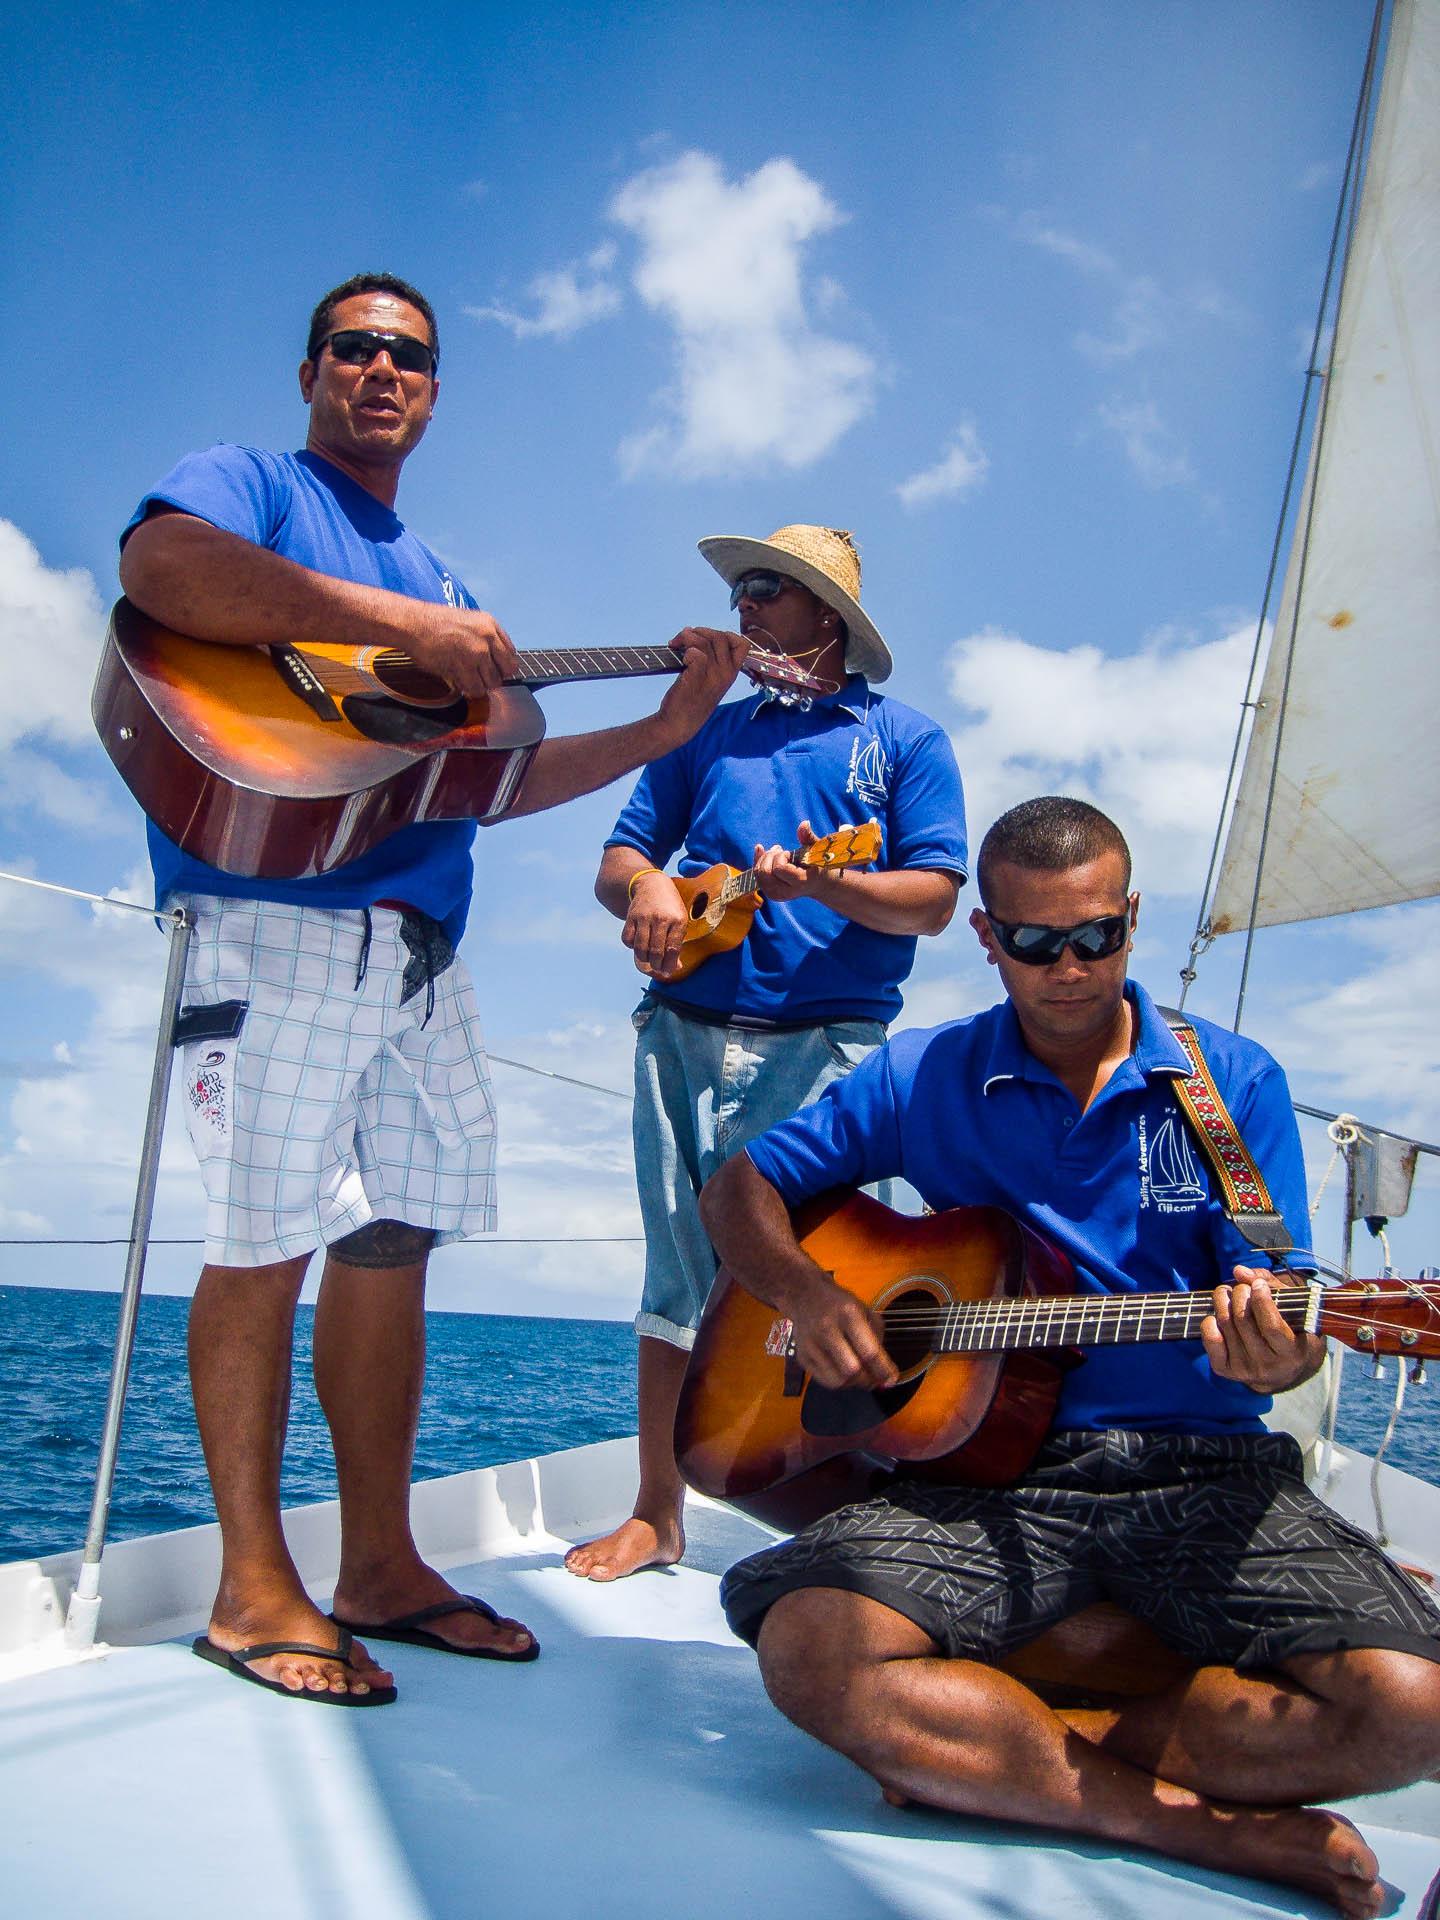 Band on the ship